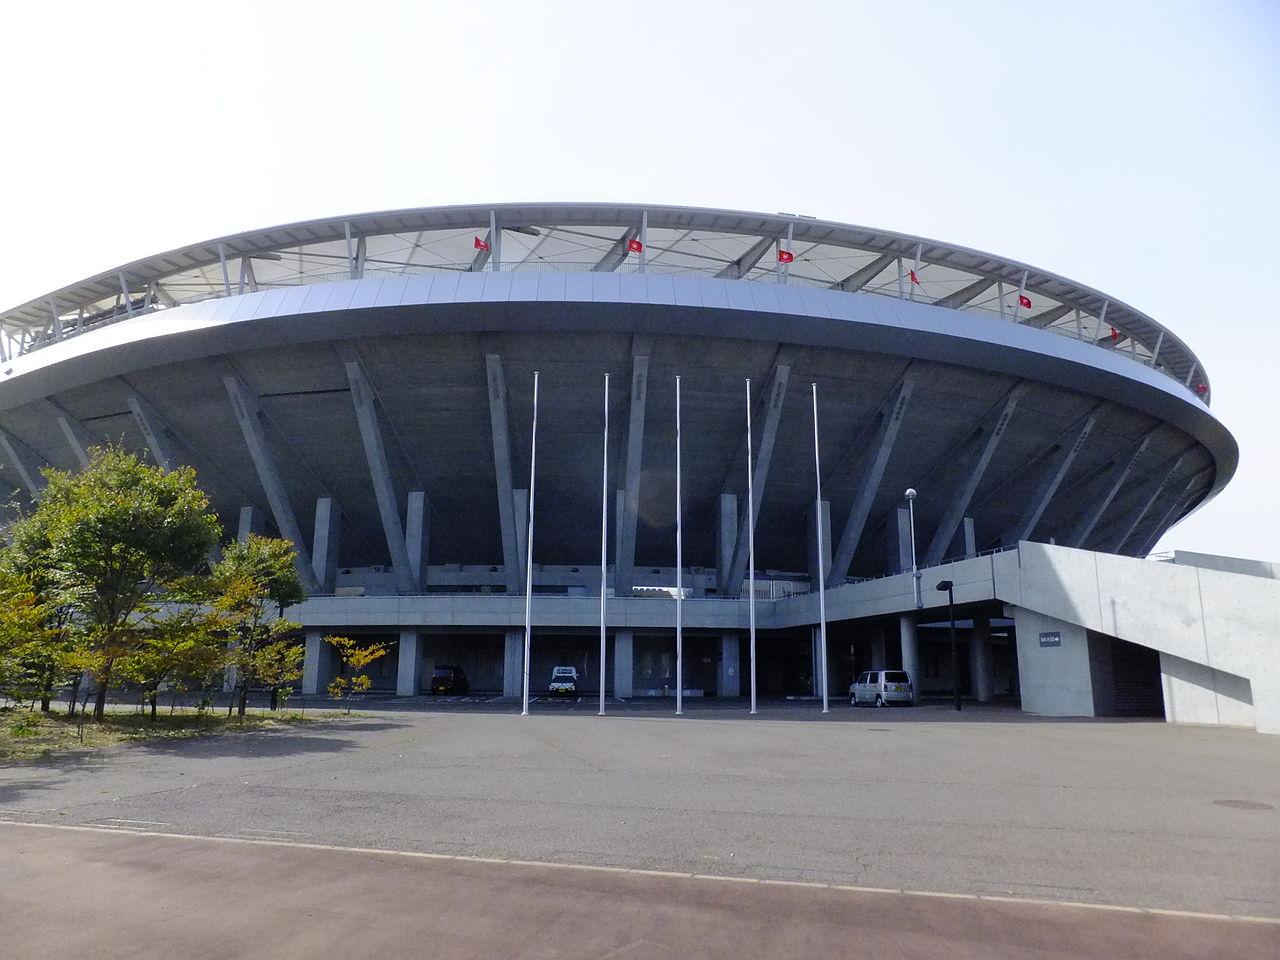 https://upload.wikimedia.org/wikipedia/commons/thumb/c/cb/Akita_Komachi_Stadium1.jpg/1280px-Akita_Komachi_Stadium1.jpg